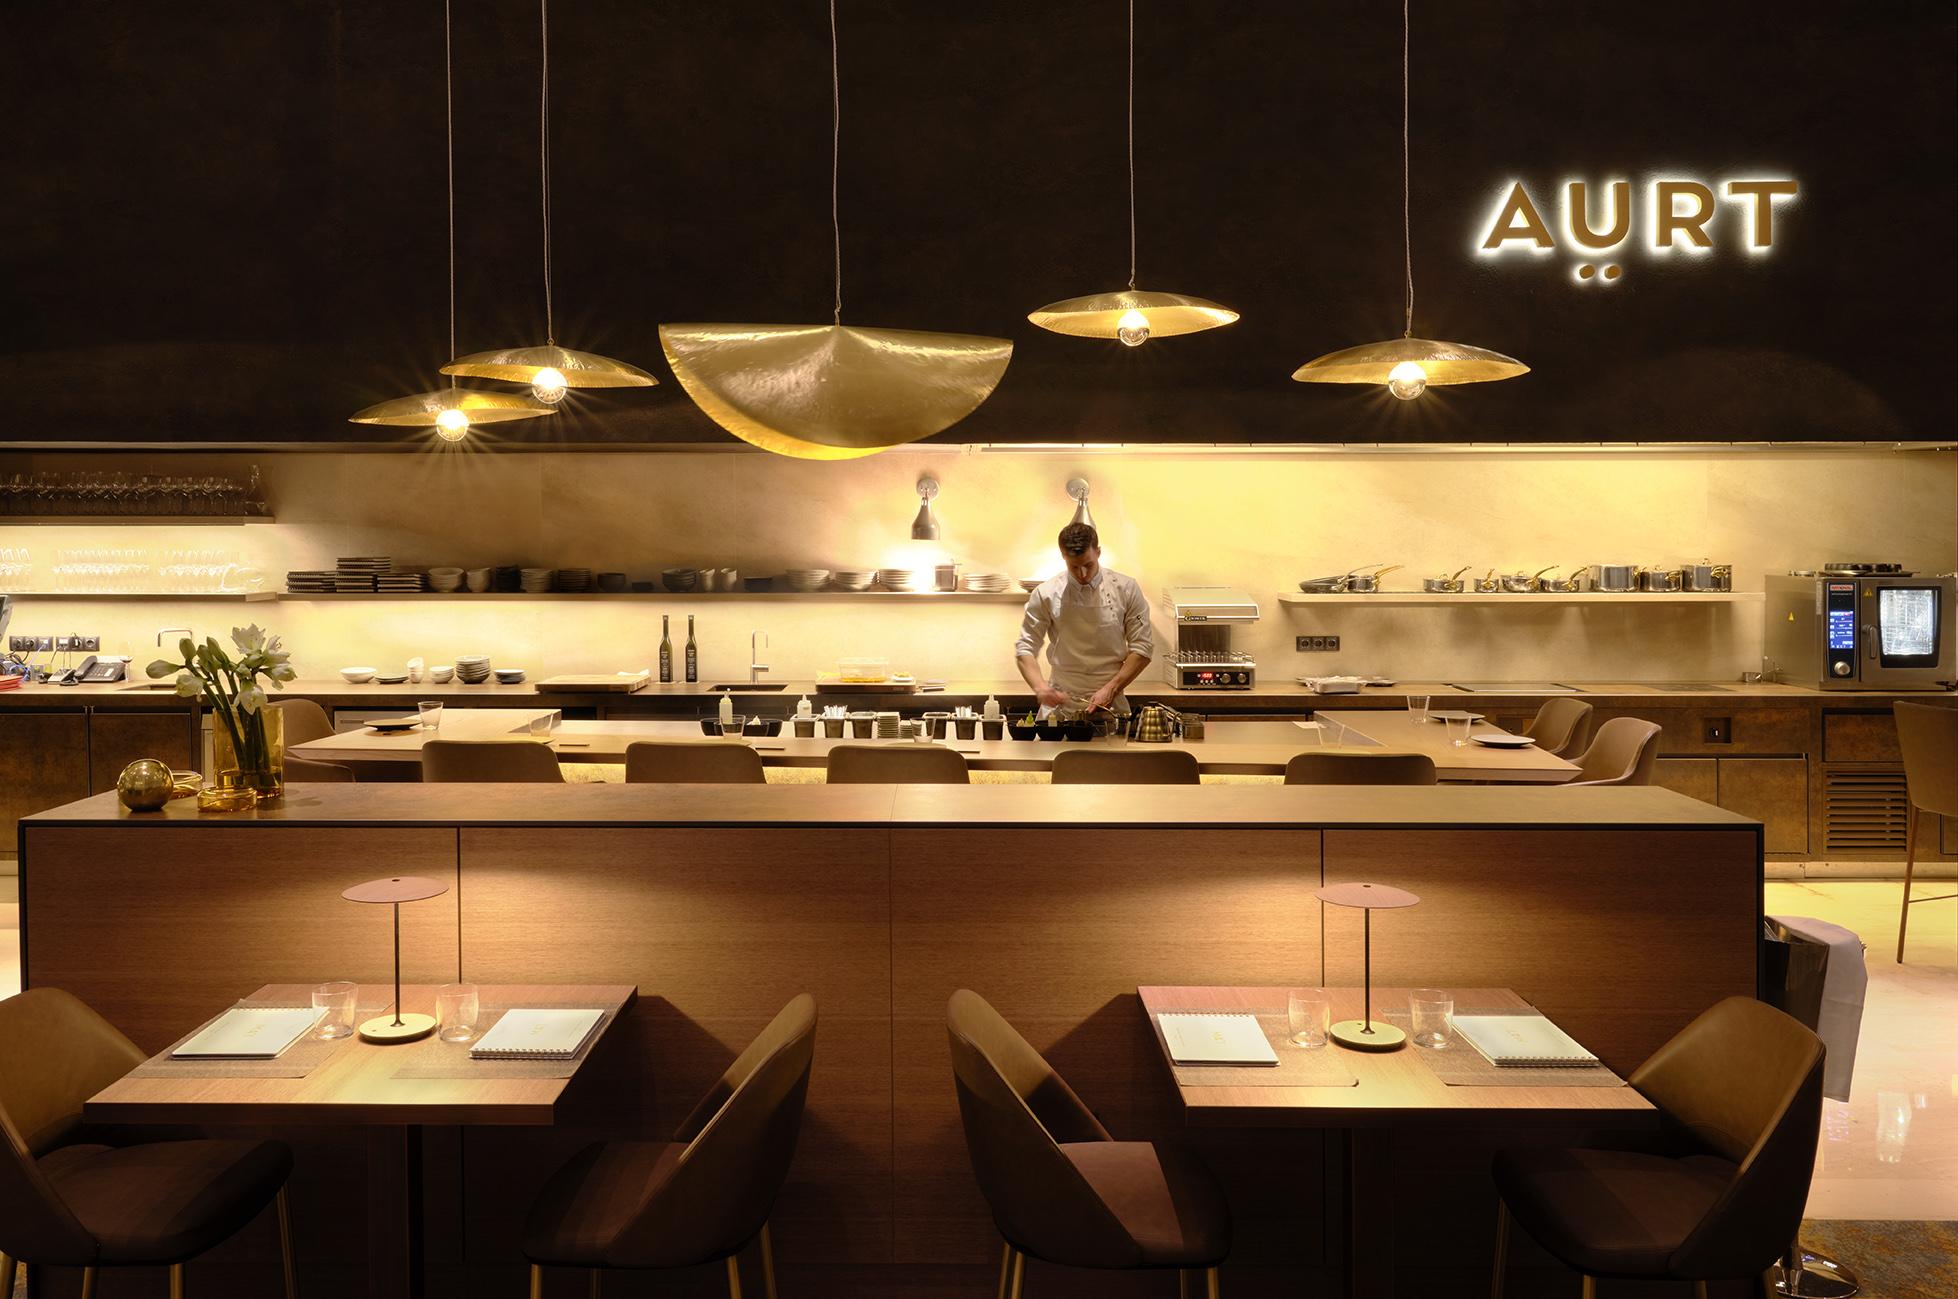 THDP win best restaurant design at the International Hotel & Property Awards 2019